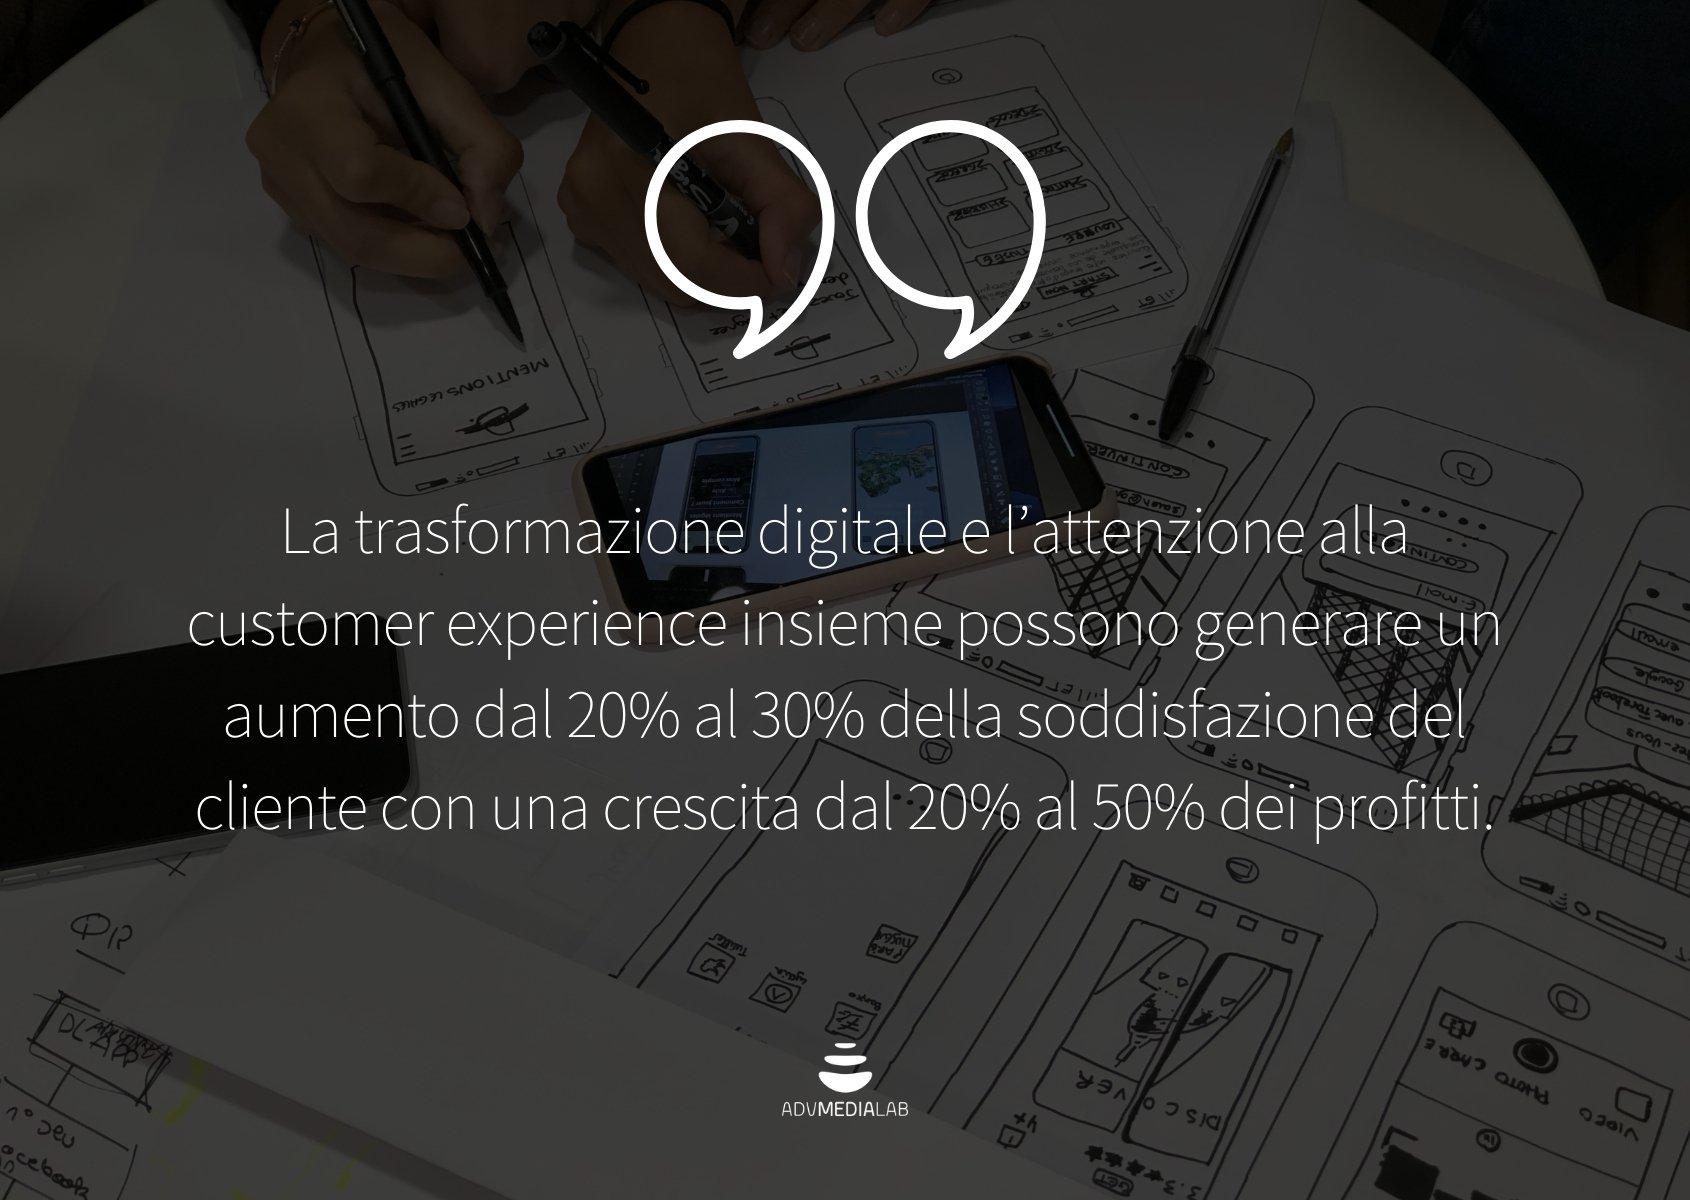 CX-digital-transformation-client-quote1